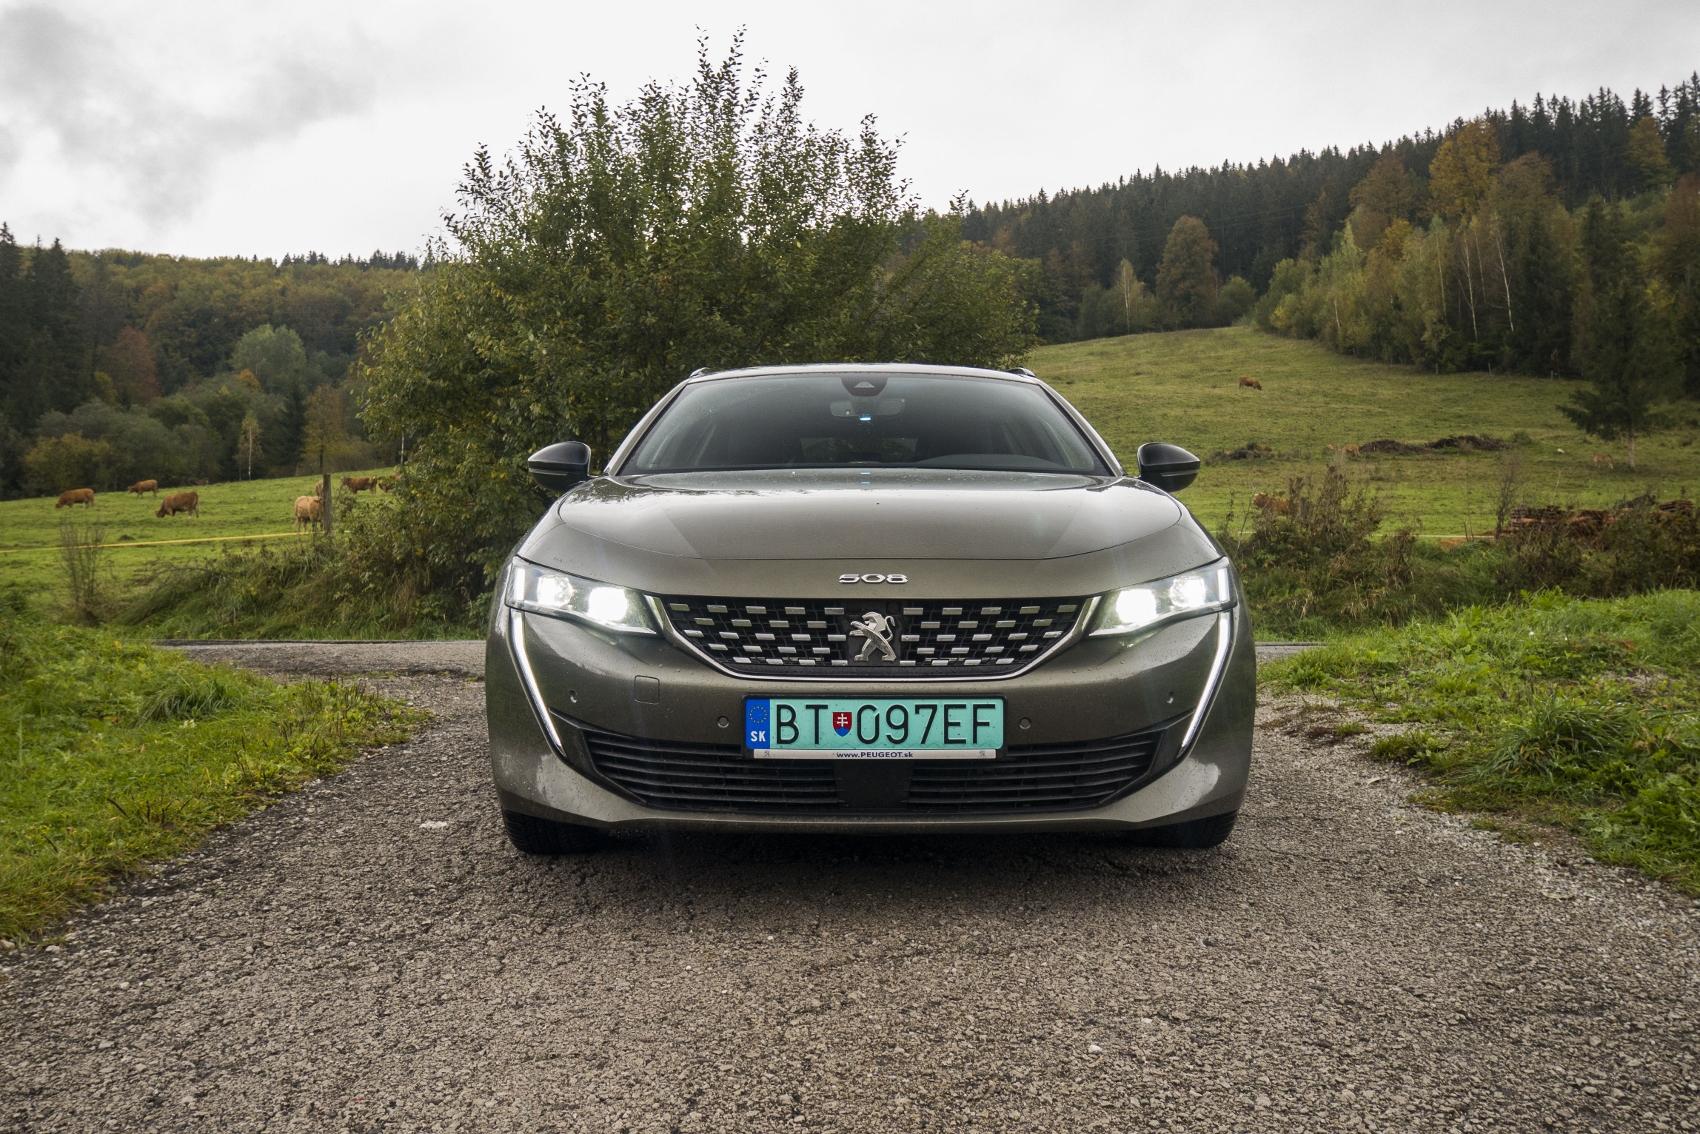 Test: Peugeot 508 SW plug in hybrid je veľmi dobré auto, ale oplatí sa?